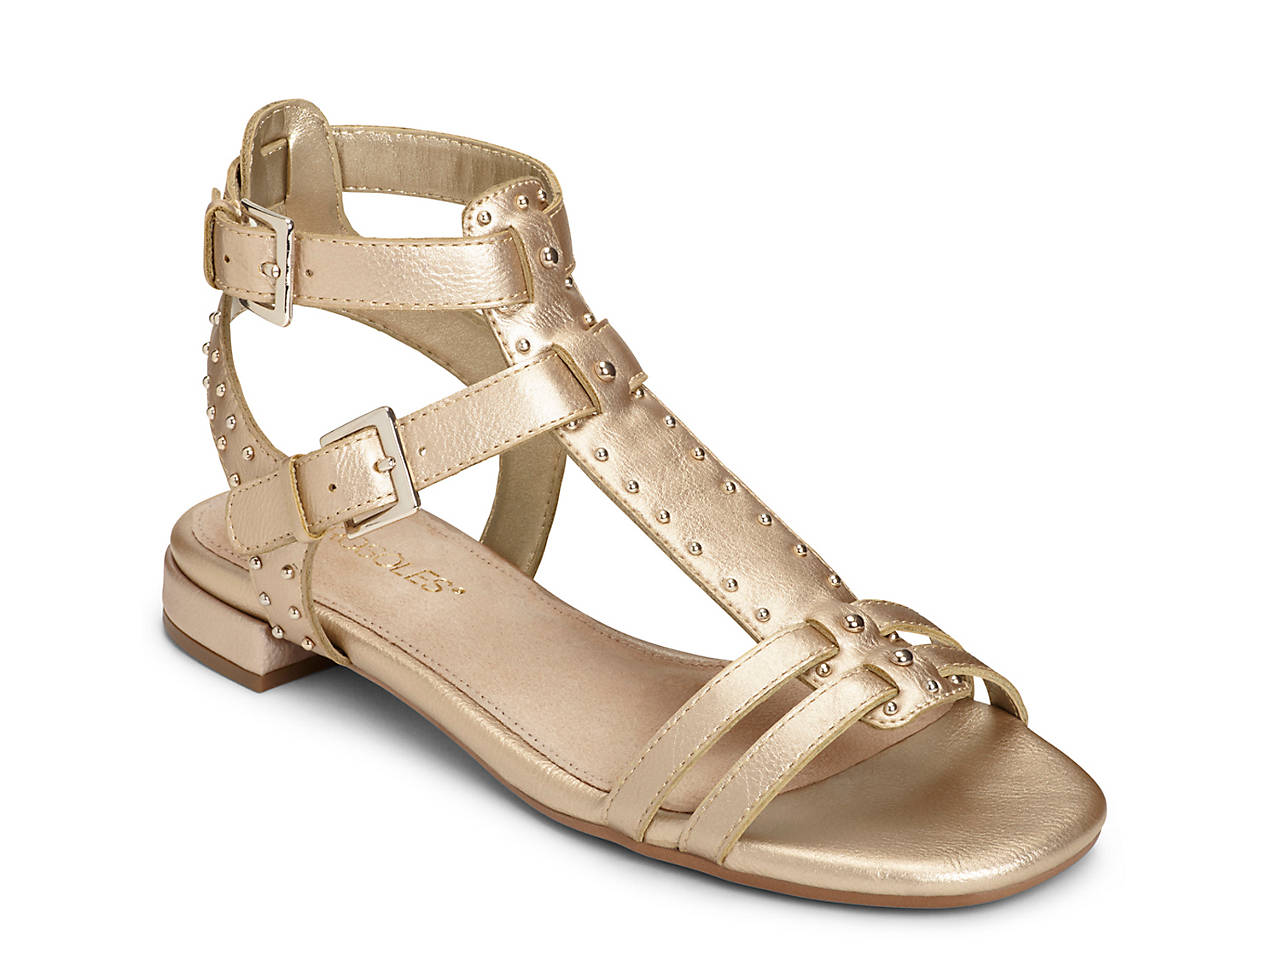 c11aec7cfa4c Aerosoles Showdown Gladiator Sandal Women s Shoes